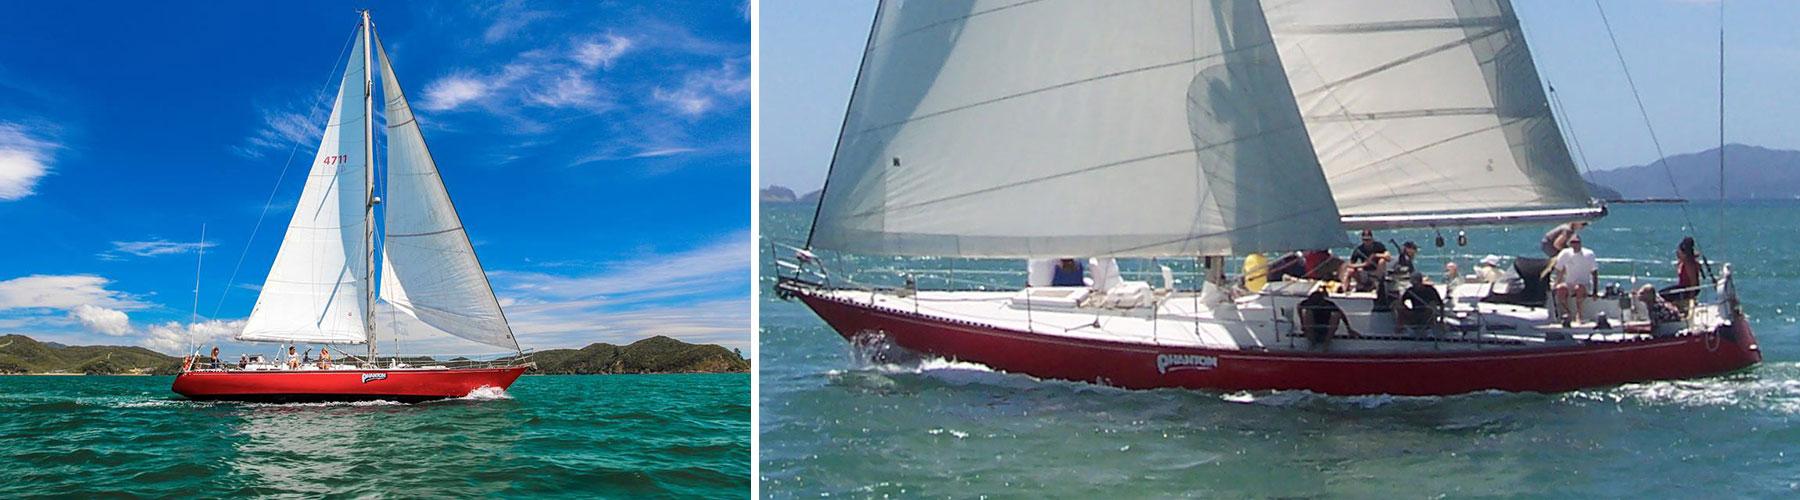 Phantom Sailing Charter Boat